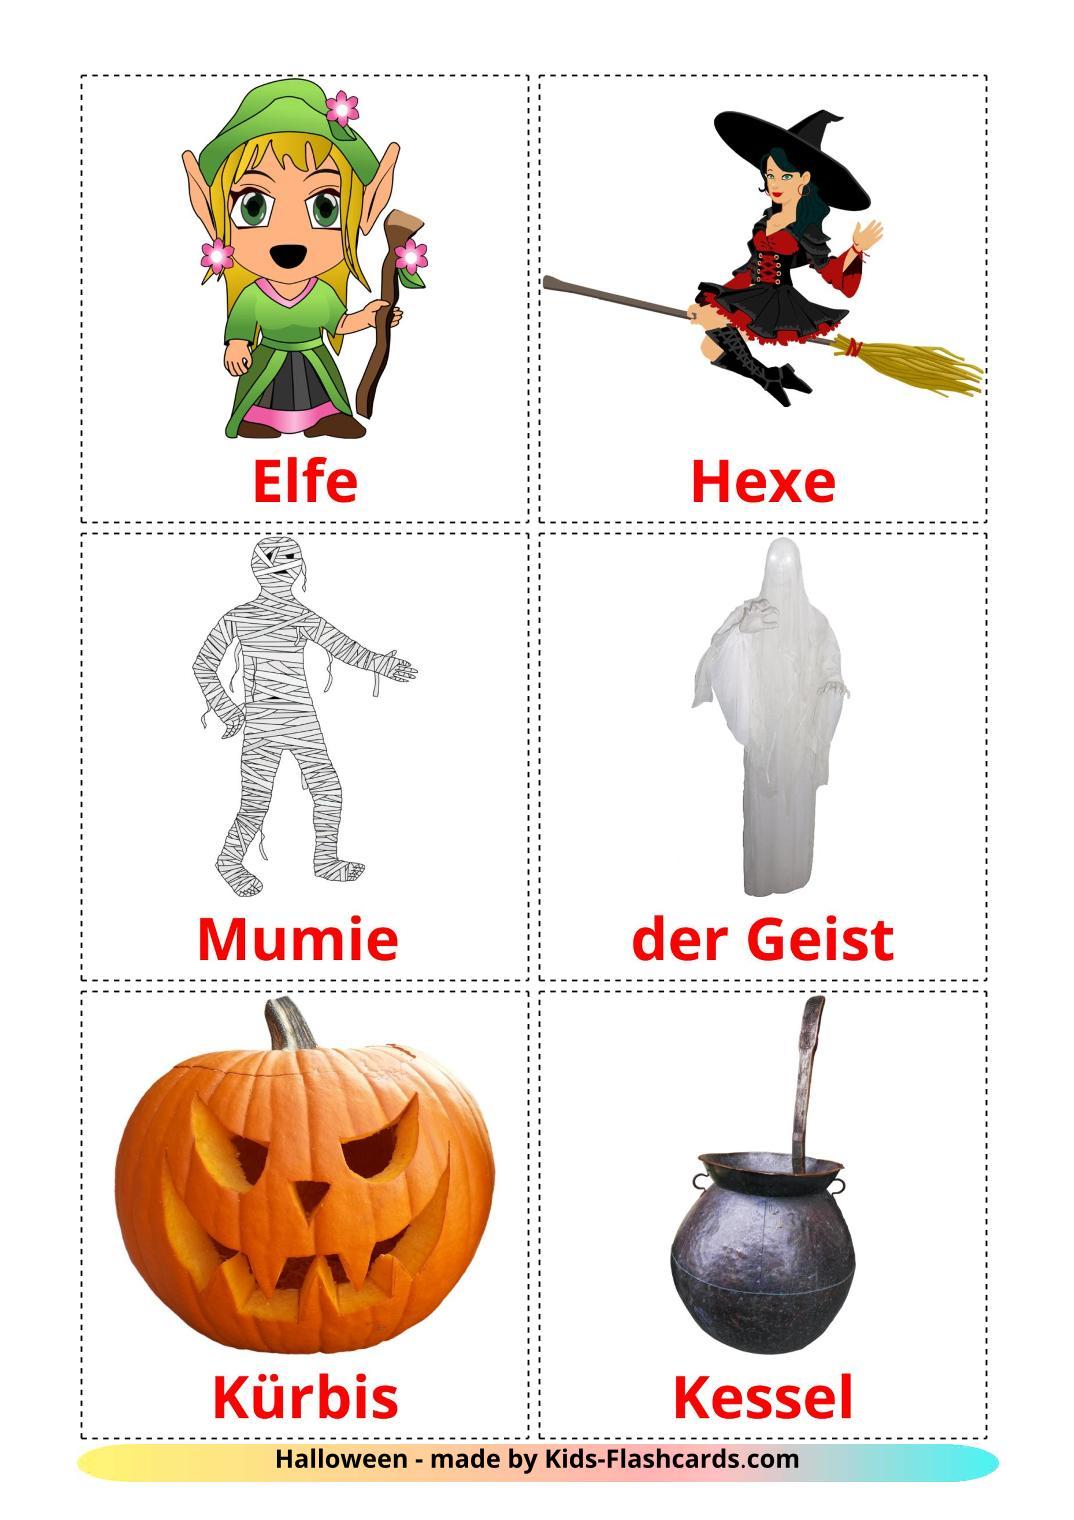 Хэллоуин - 16 Карточек Домана на немецком